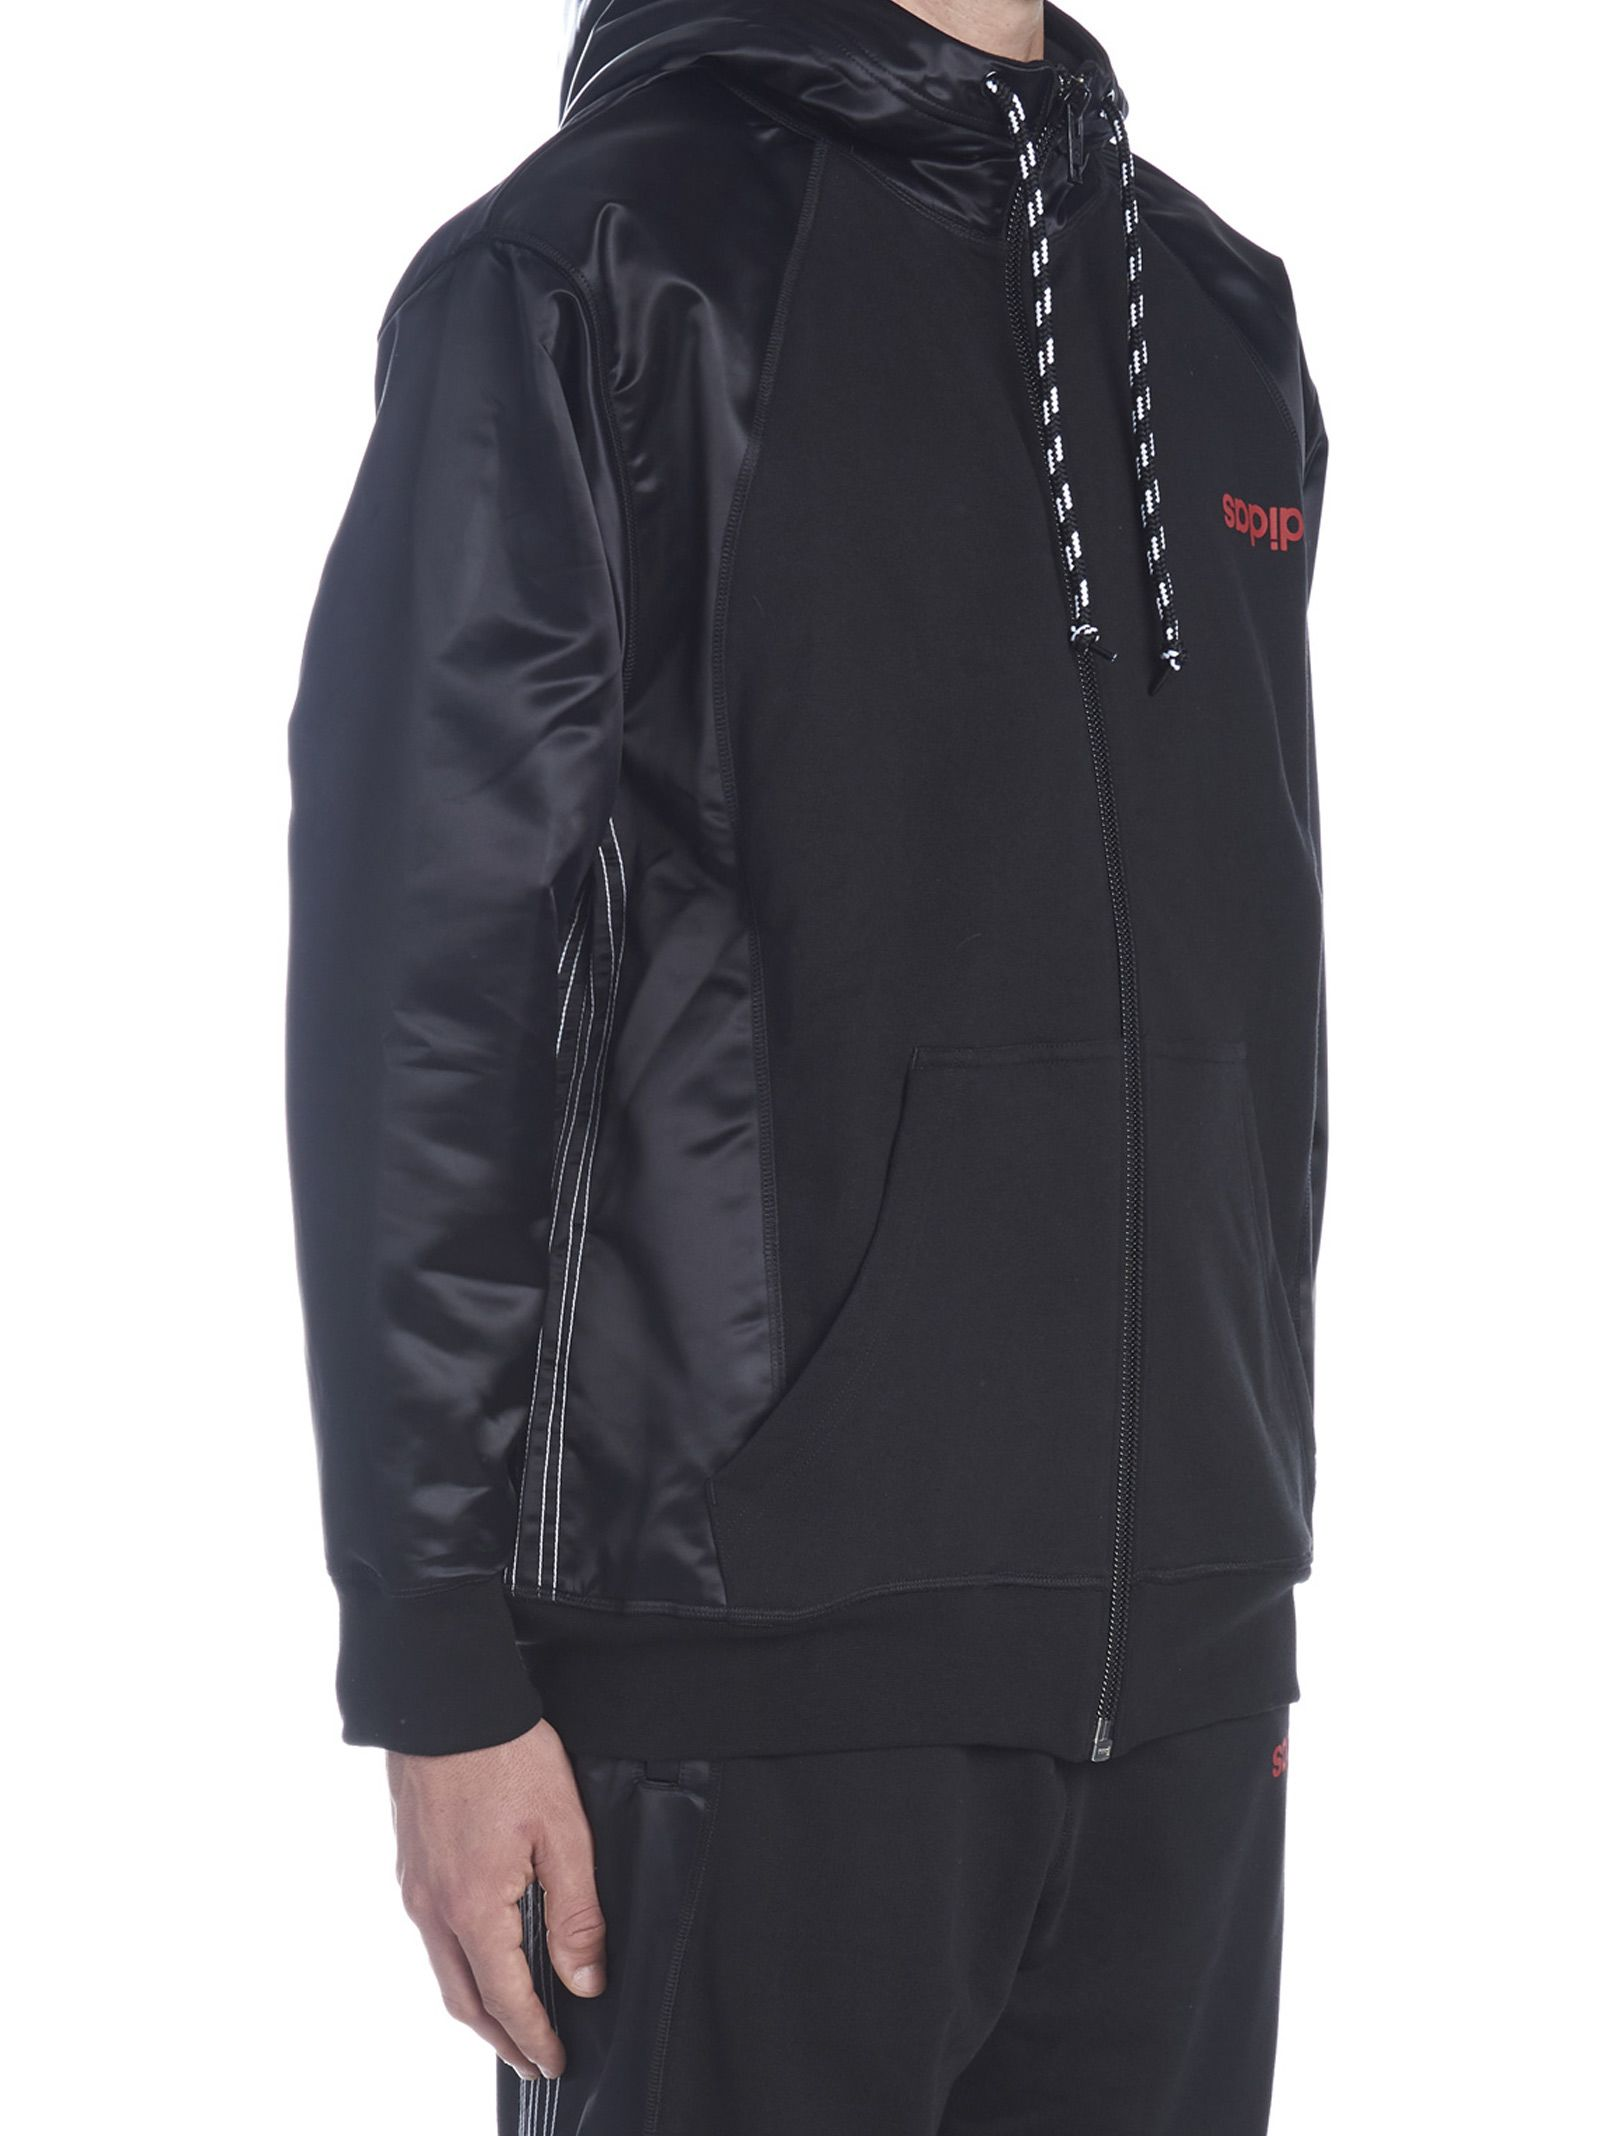 meet 2b001 6c1bc ... Adidas Originals by Alexander Wang aw Hoodie - Black ...